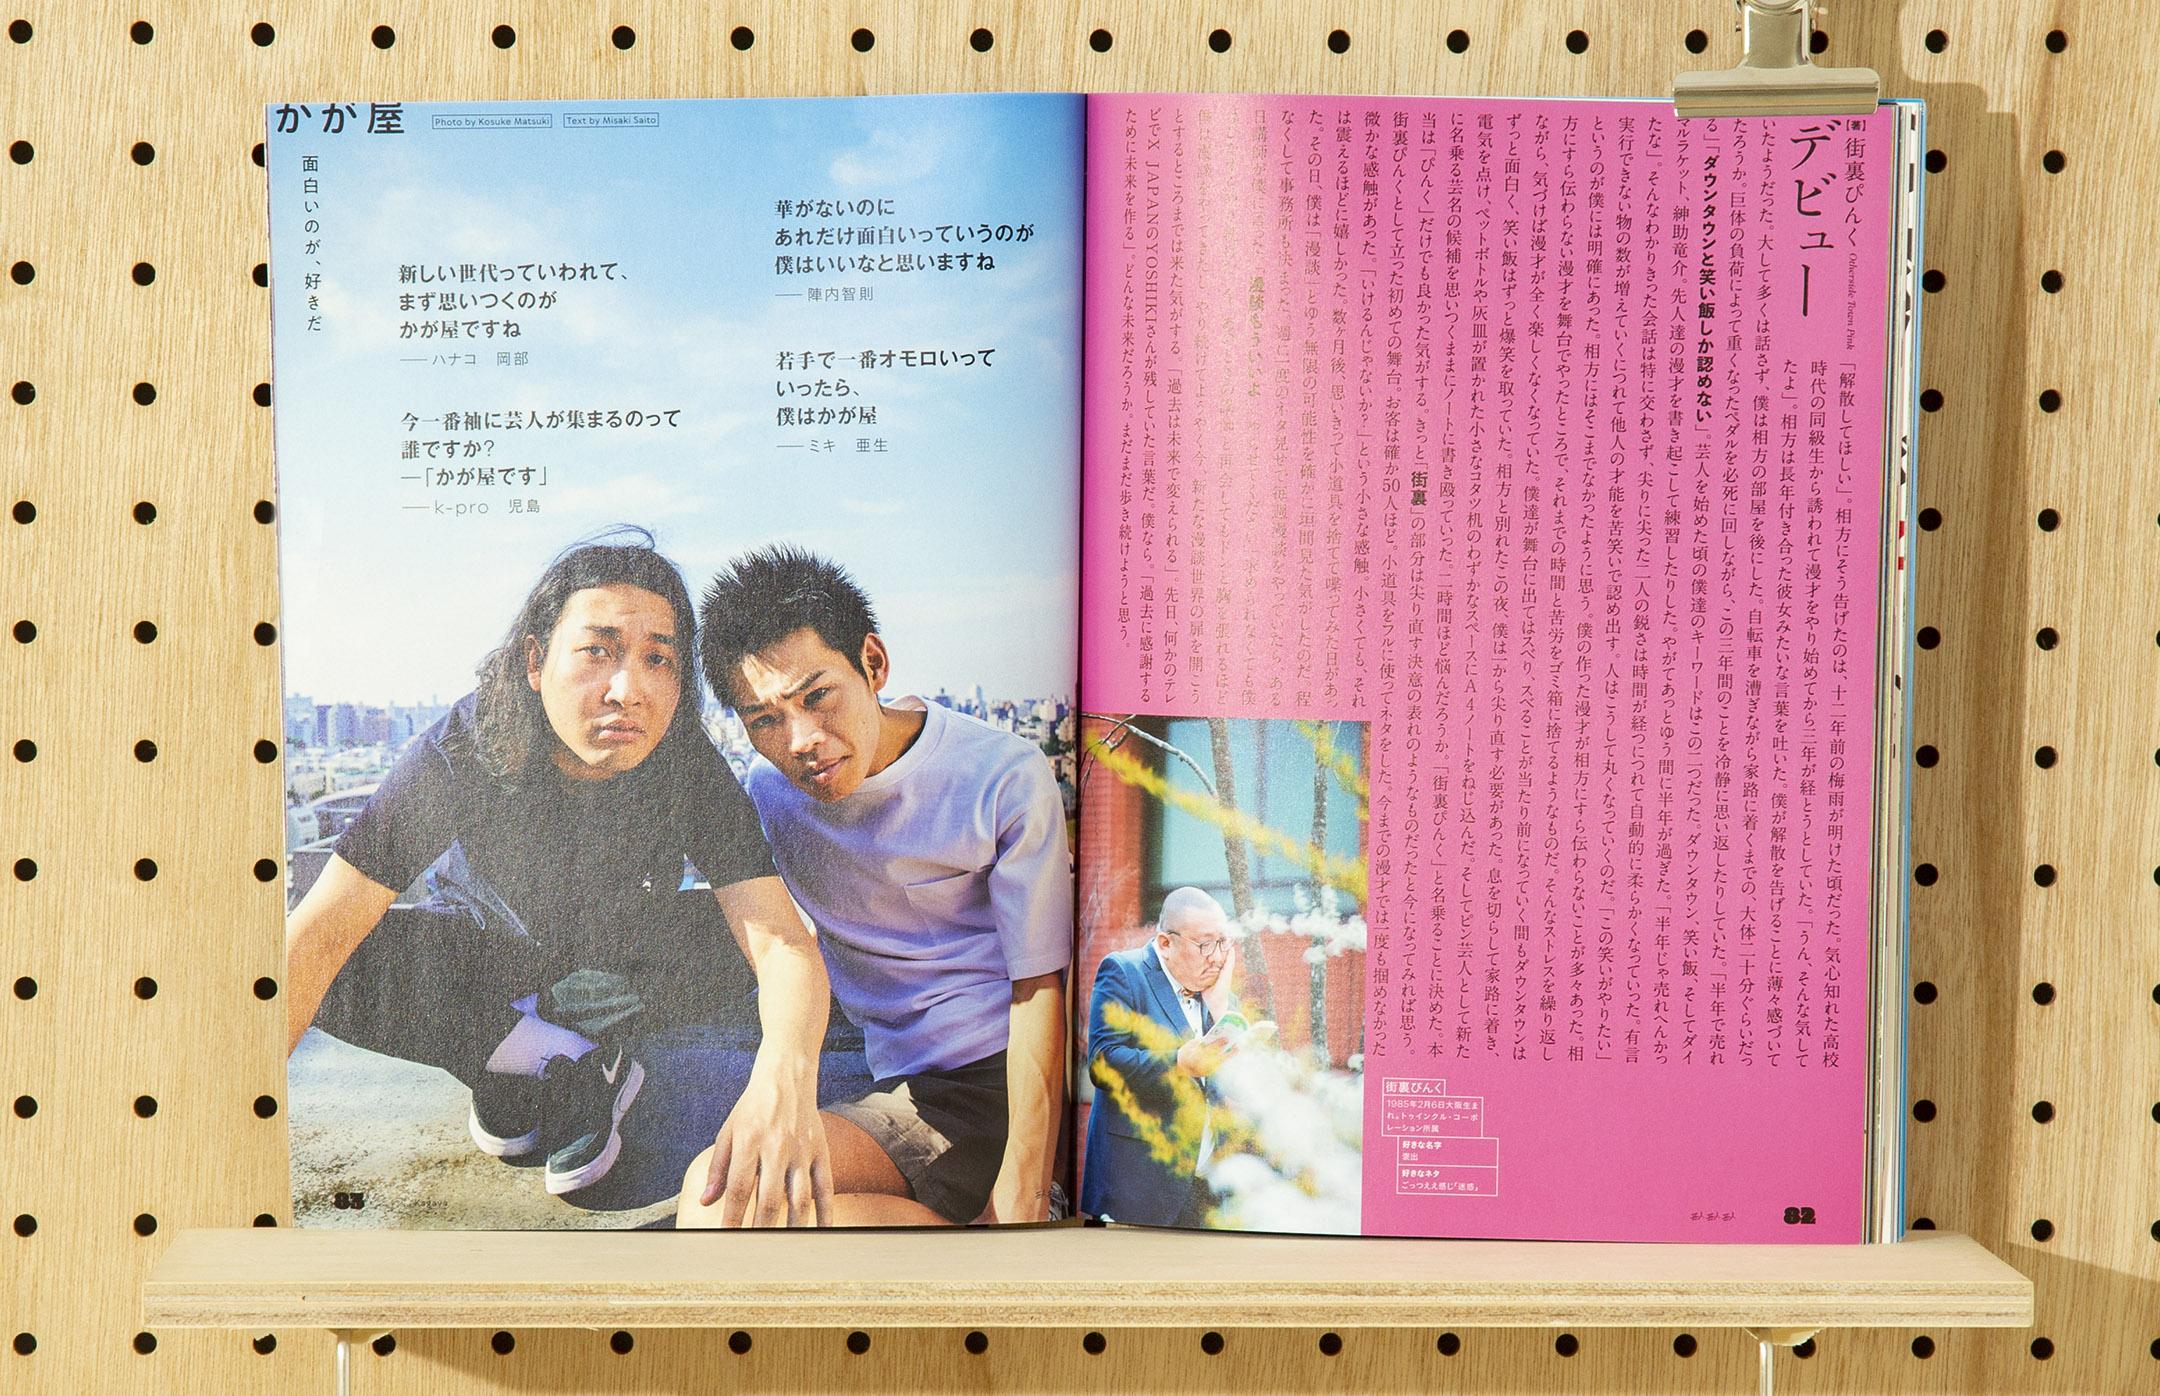 soda design 芸人芸人芸人 vol.1